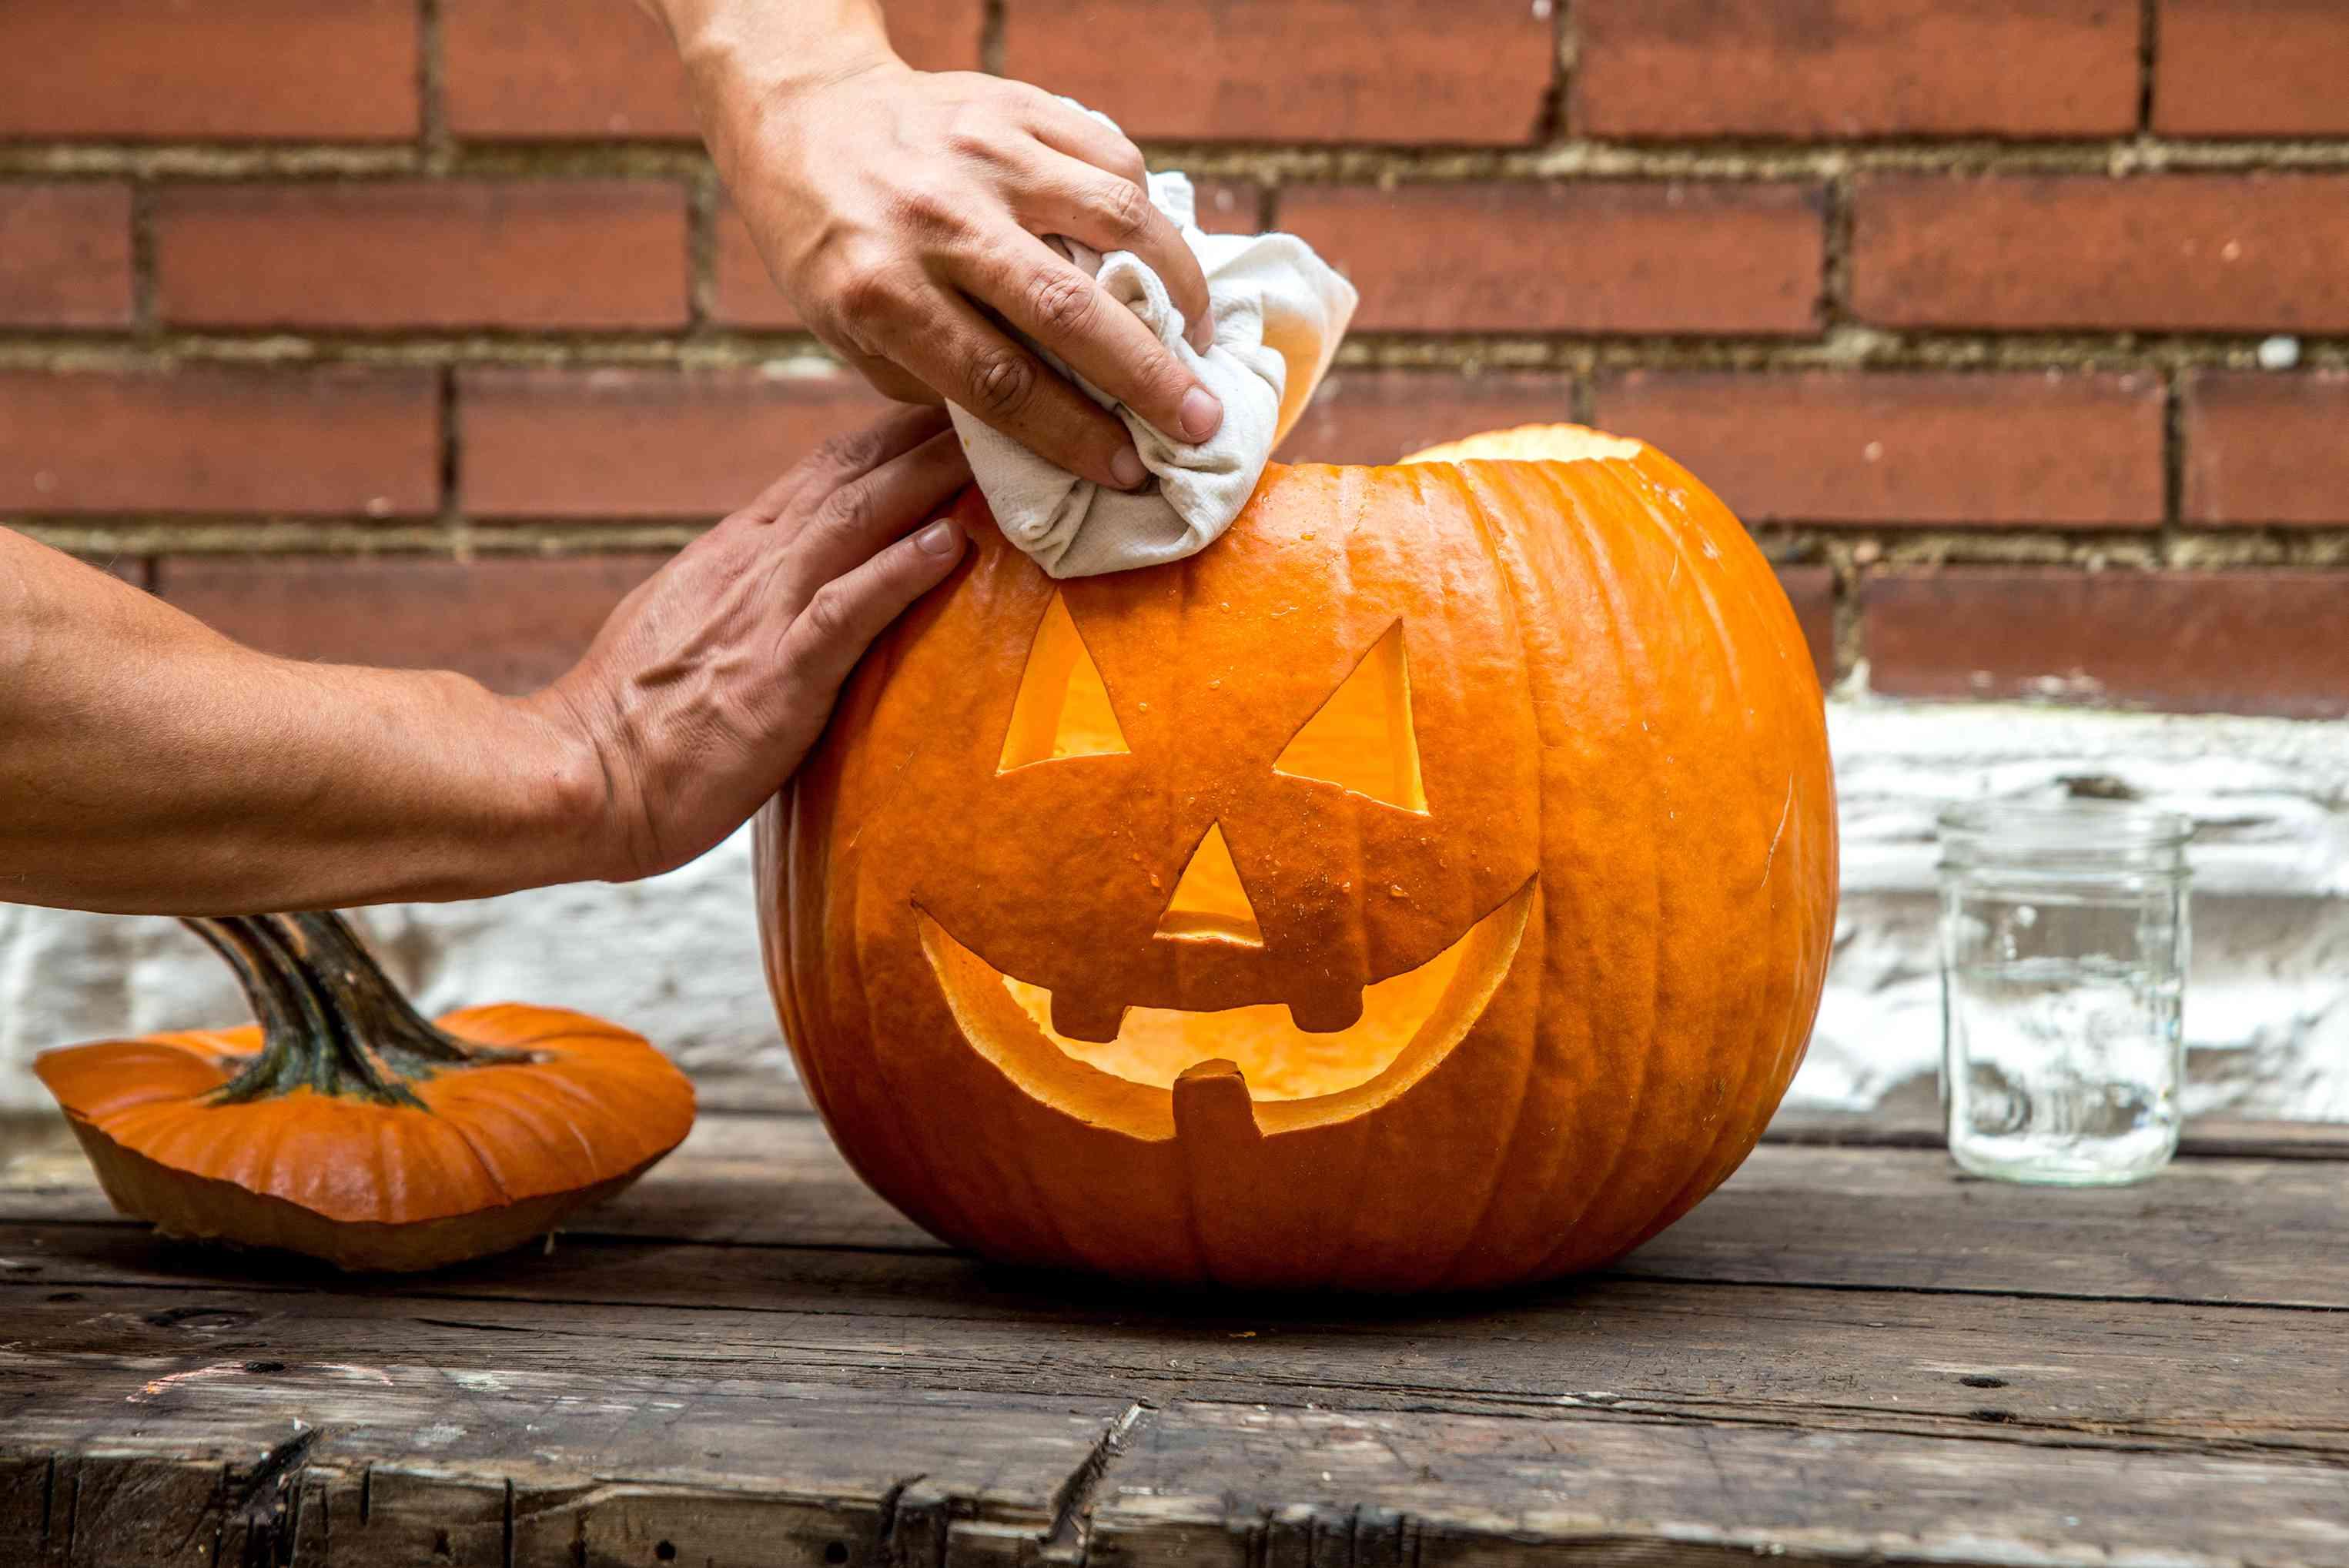 hands wipe off carved pumpkin outside